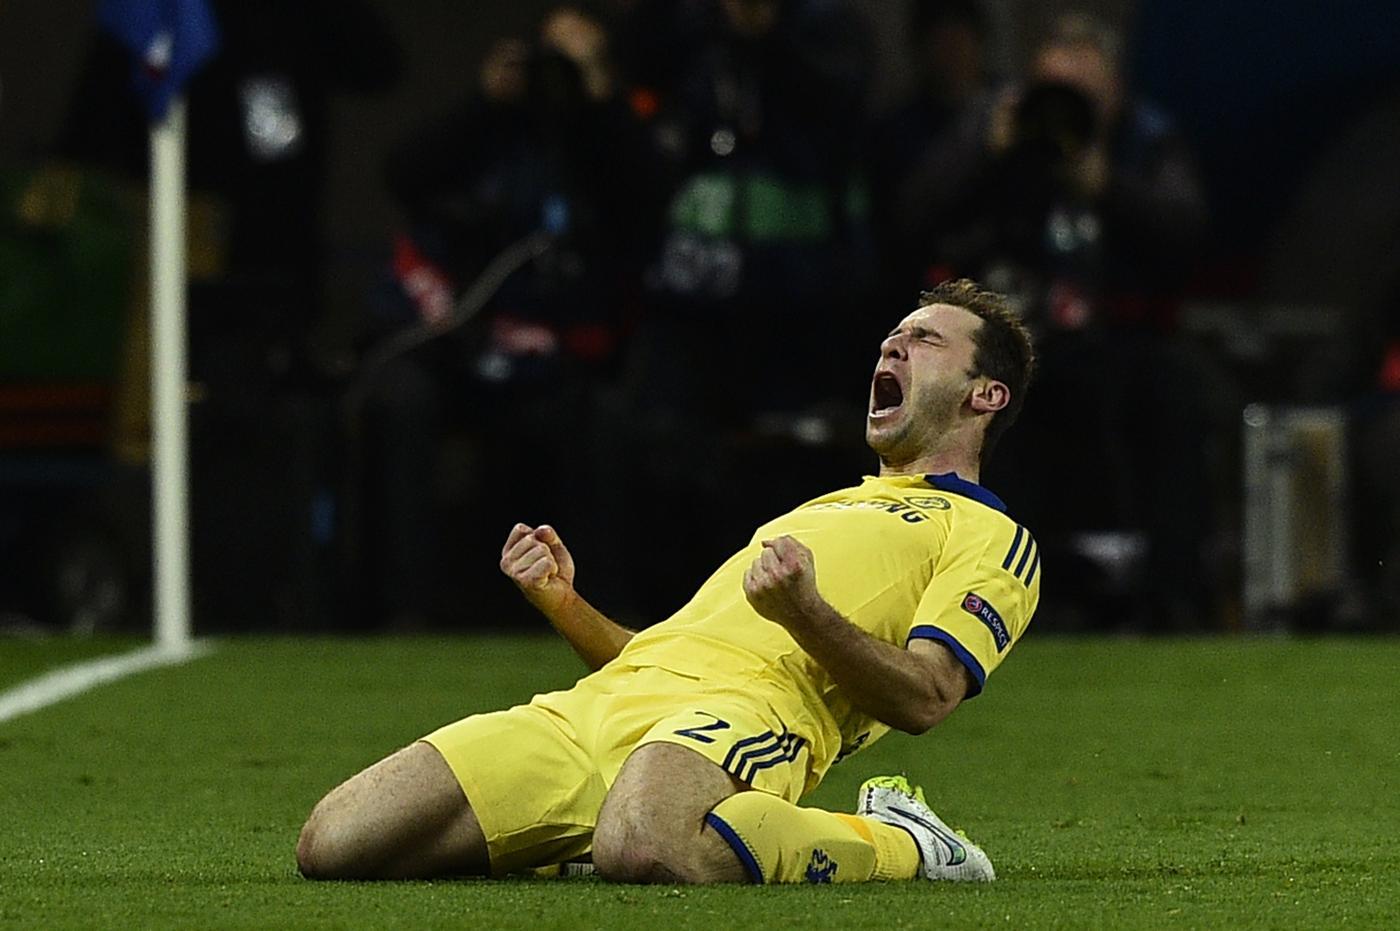 How will Chelsea line-up for their Champions League clash against Paris Saint-Germain?